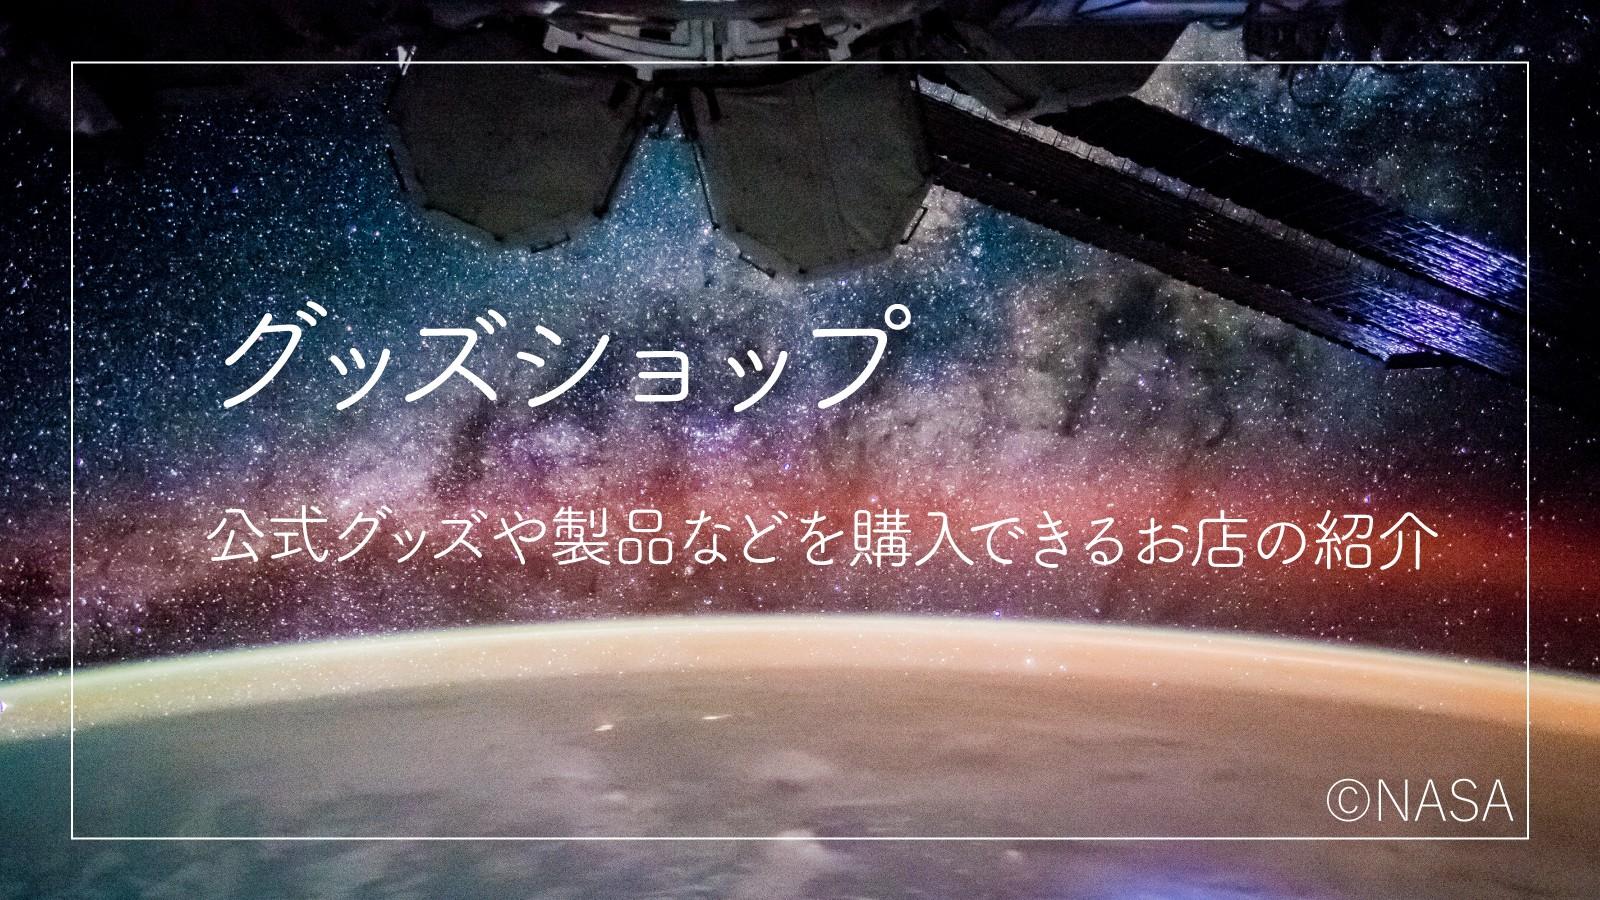 SHOP:宇宙開発企業や組織などによる公式グッズや人工衛星を販売しているショップ